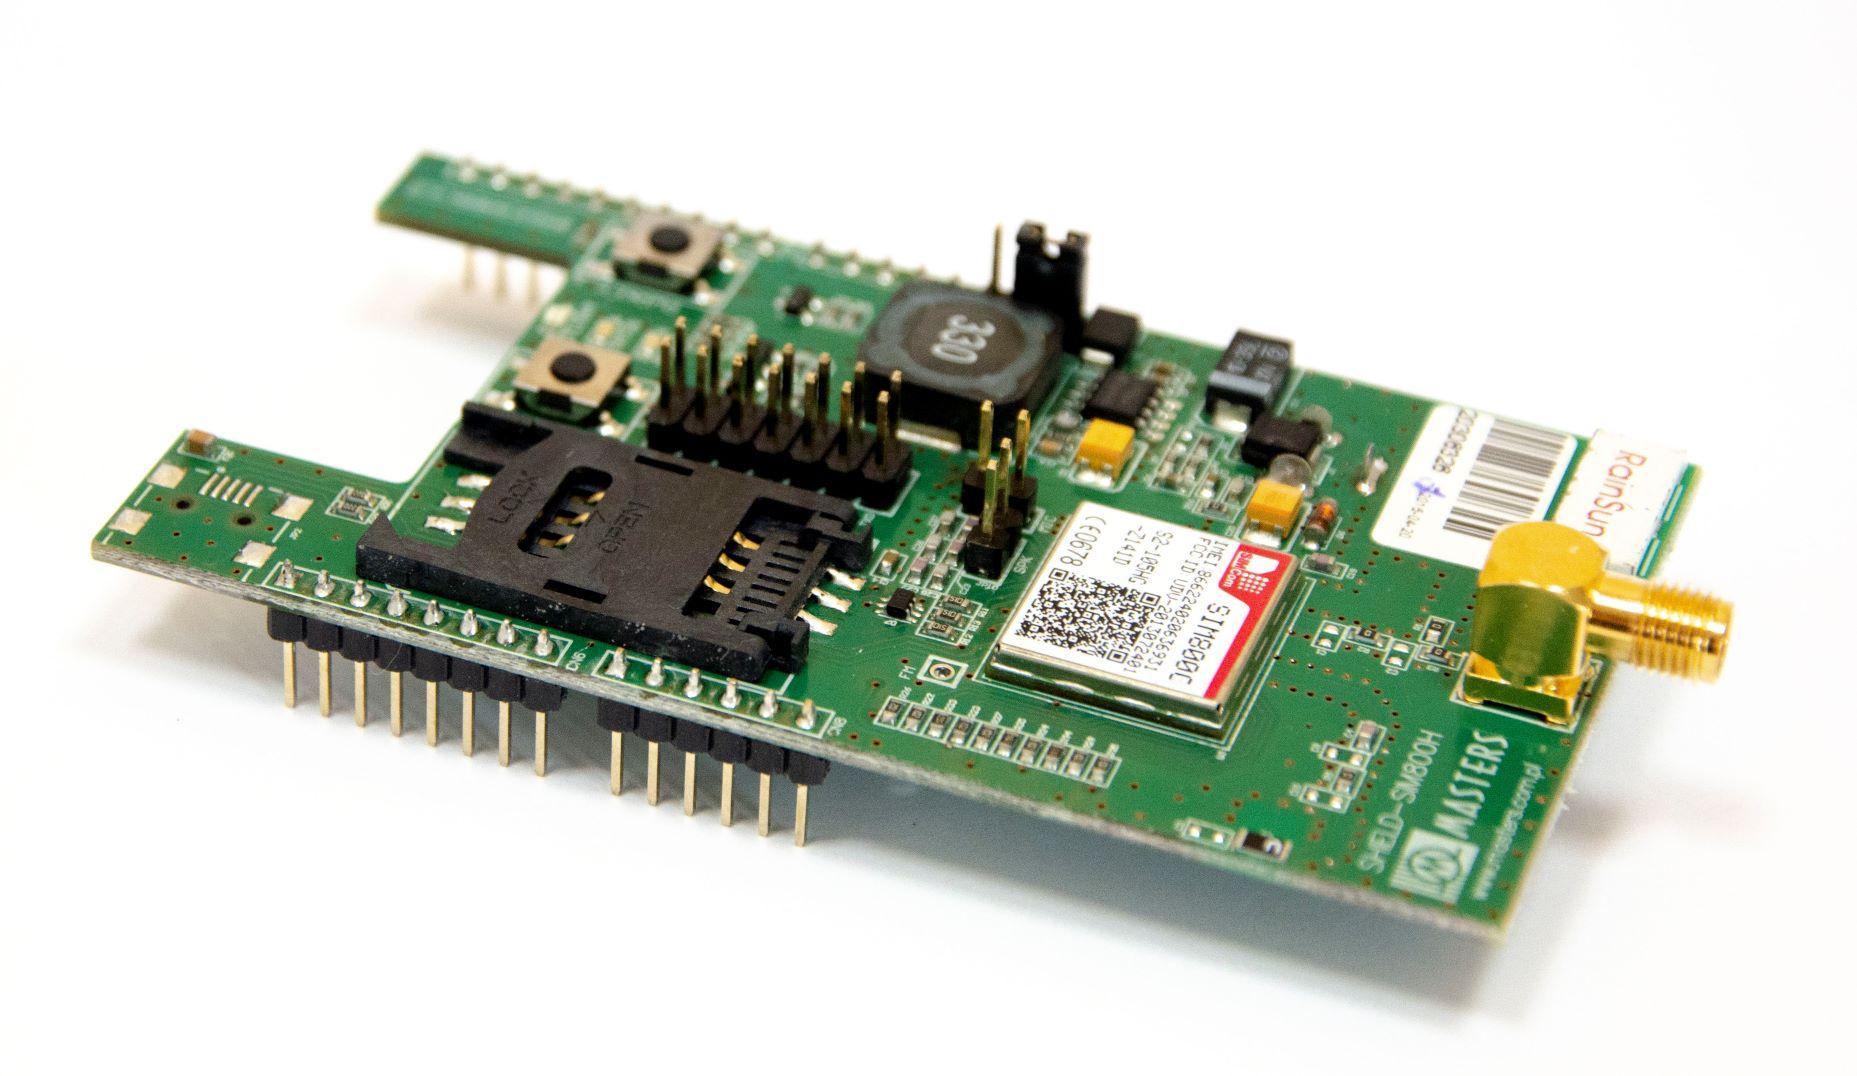 evalbrd_sim800c